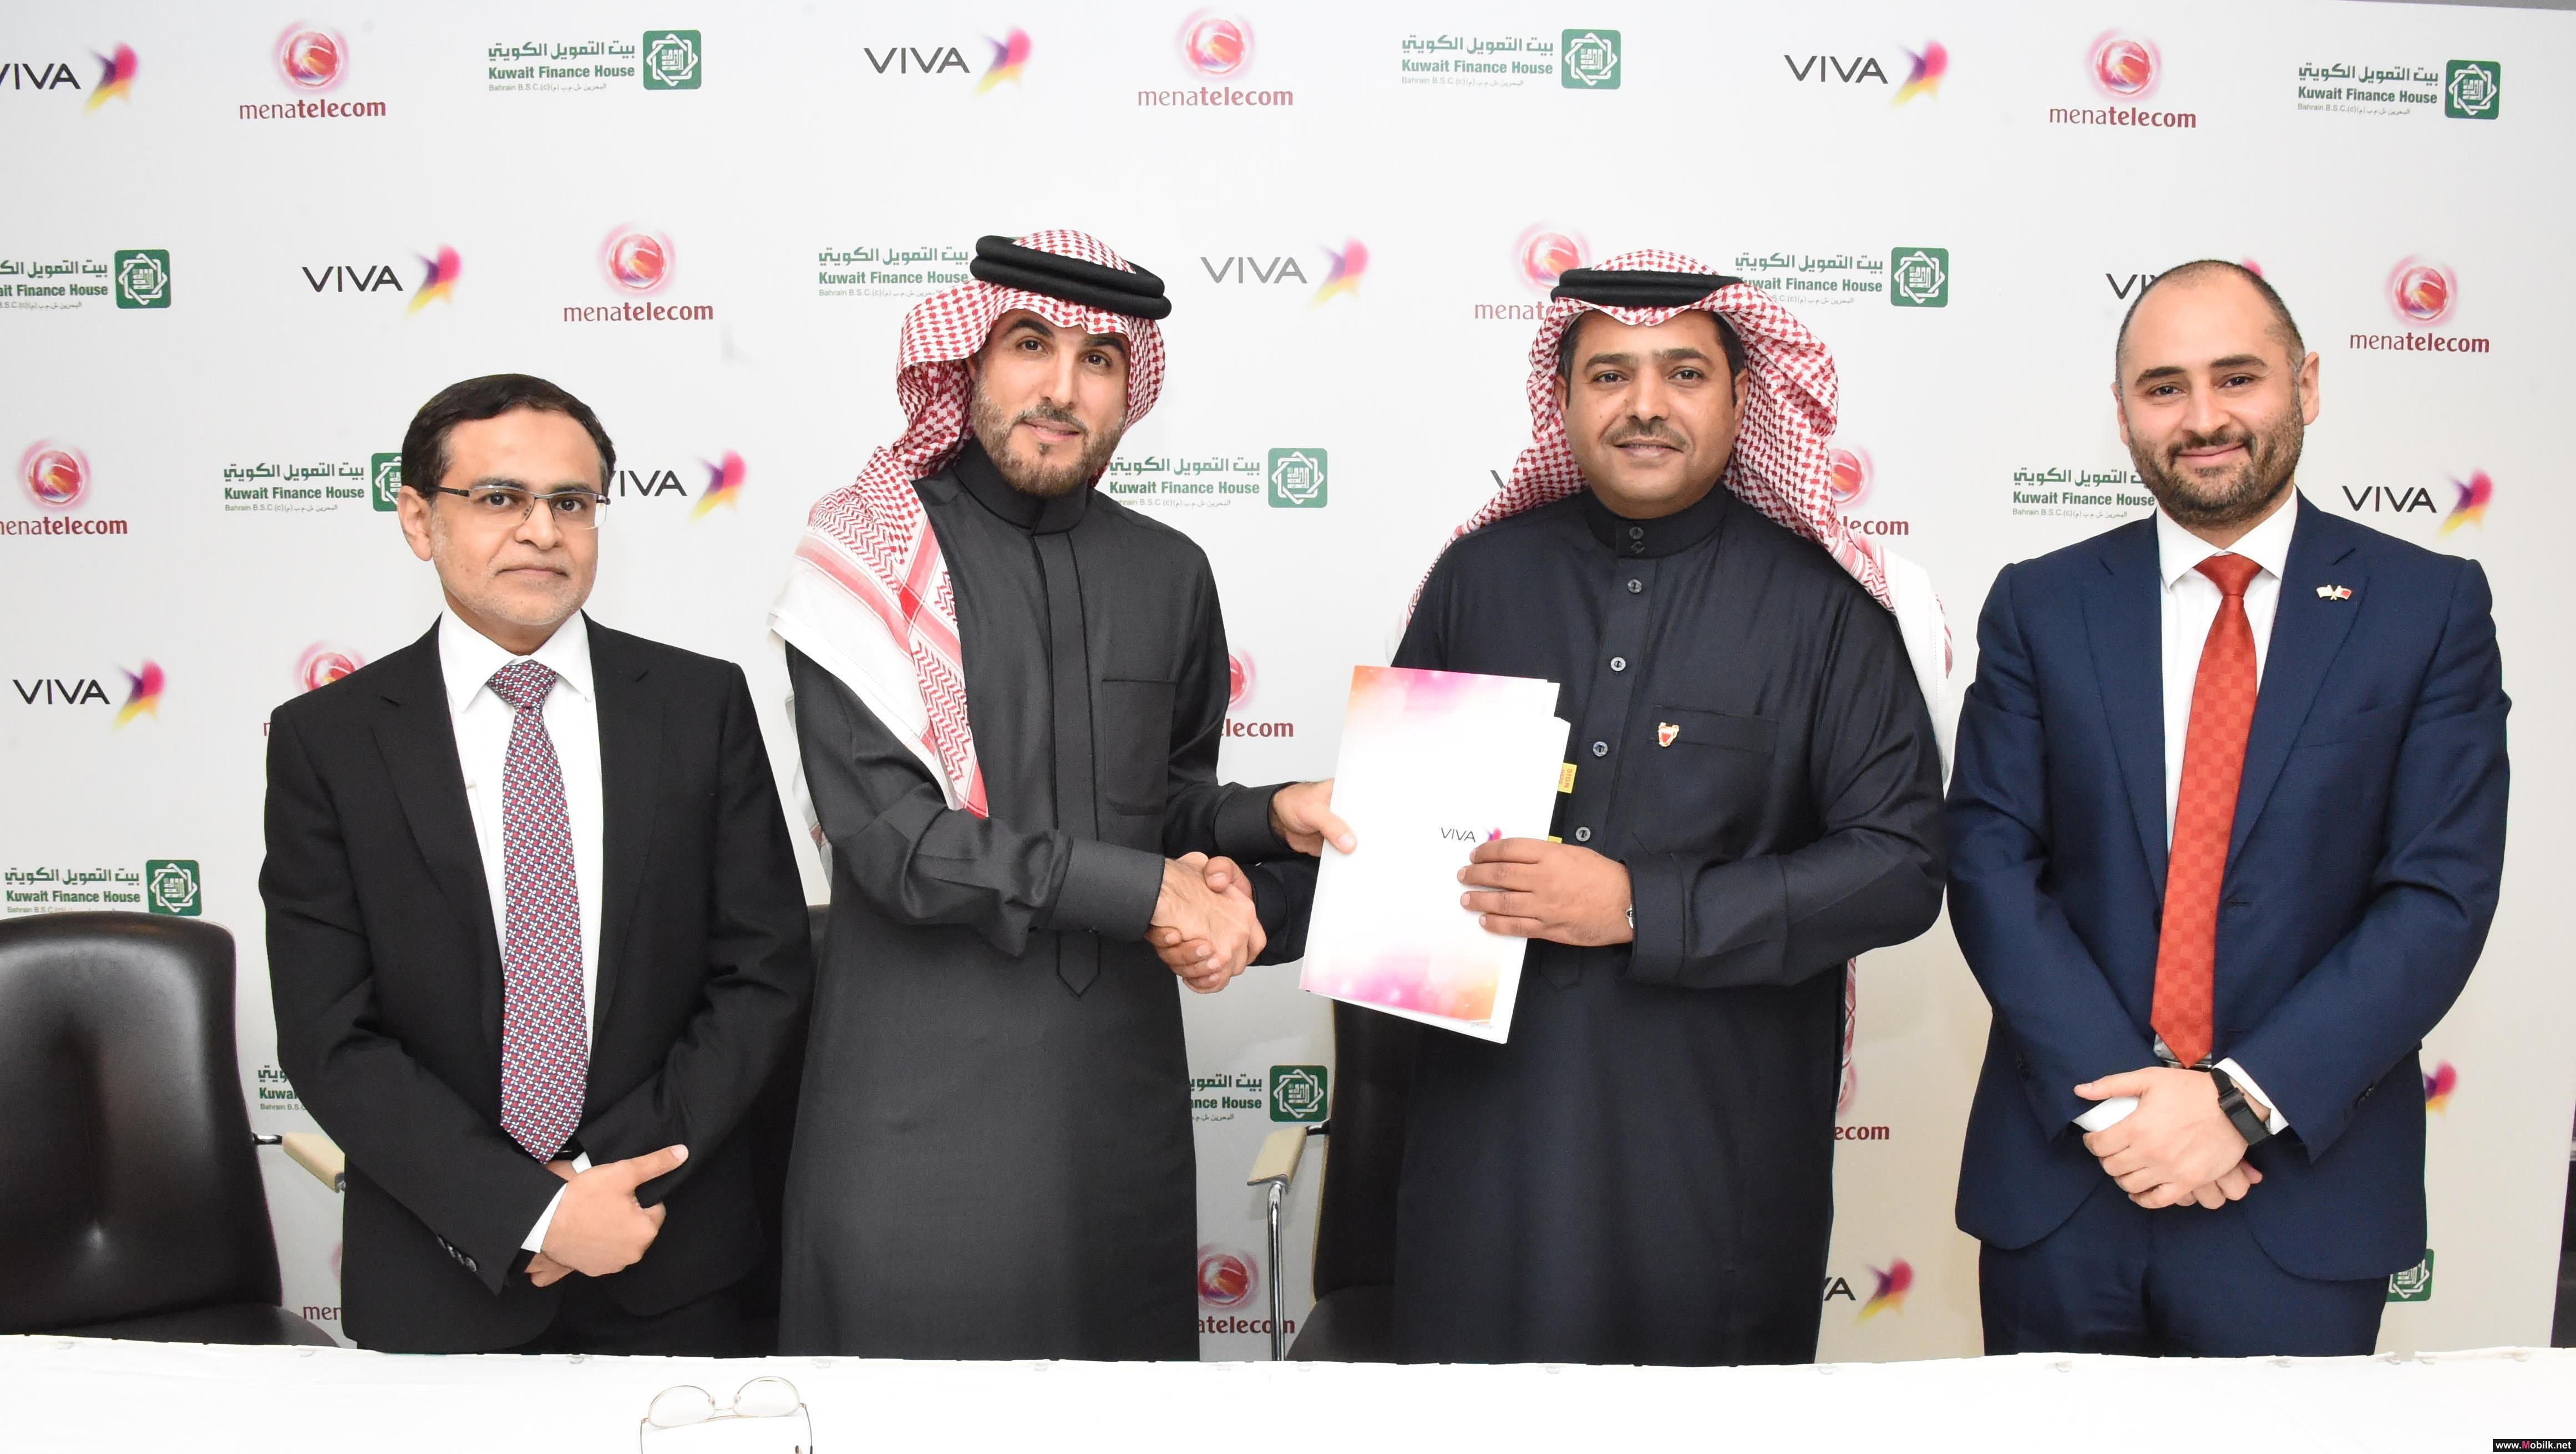 VIVA البحرين تستحوذ على